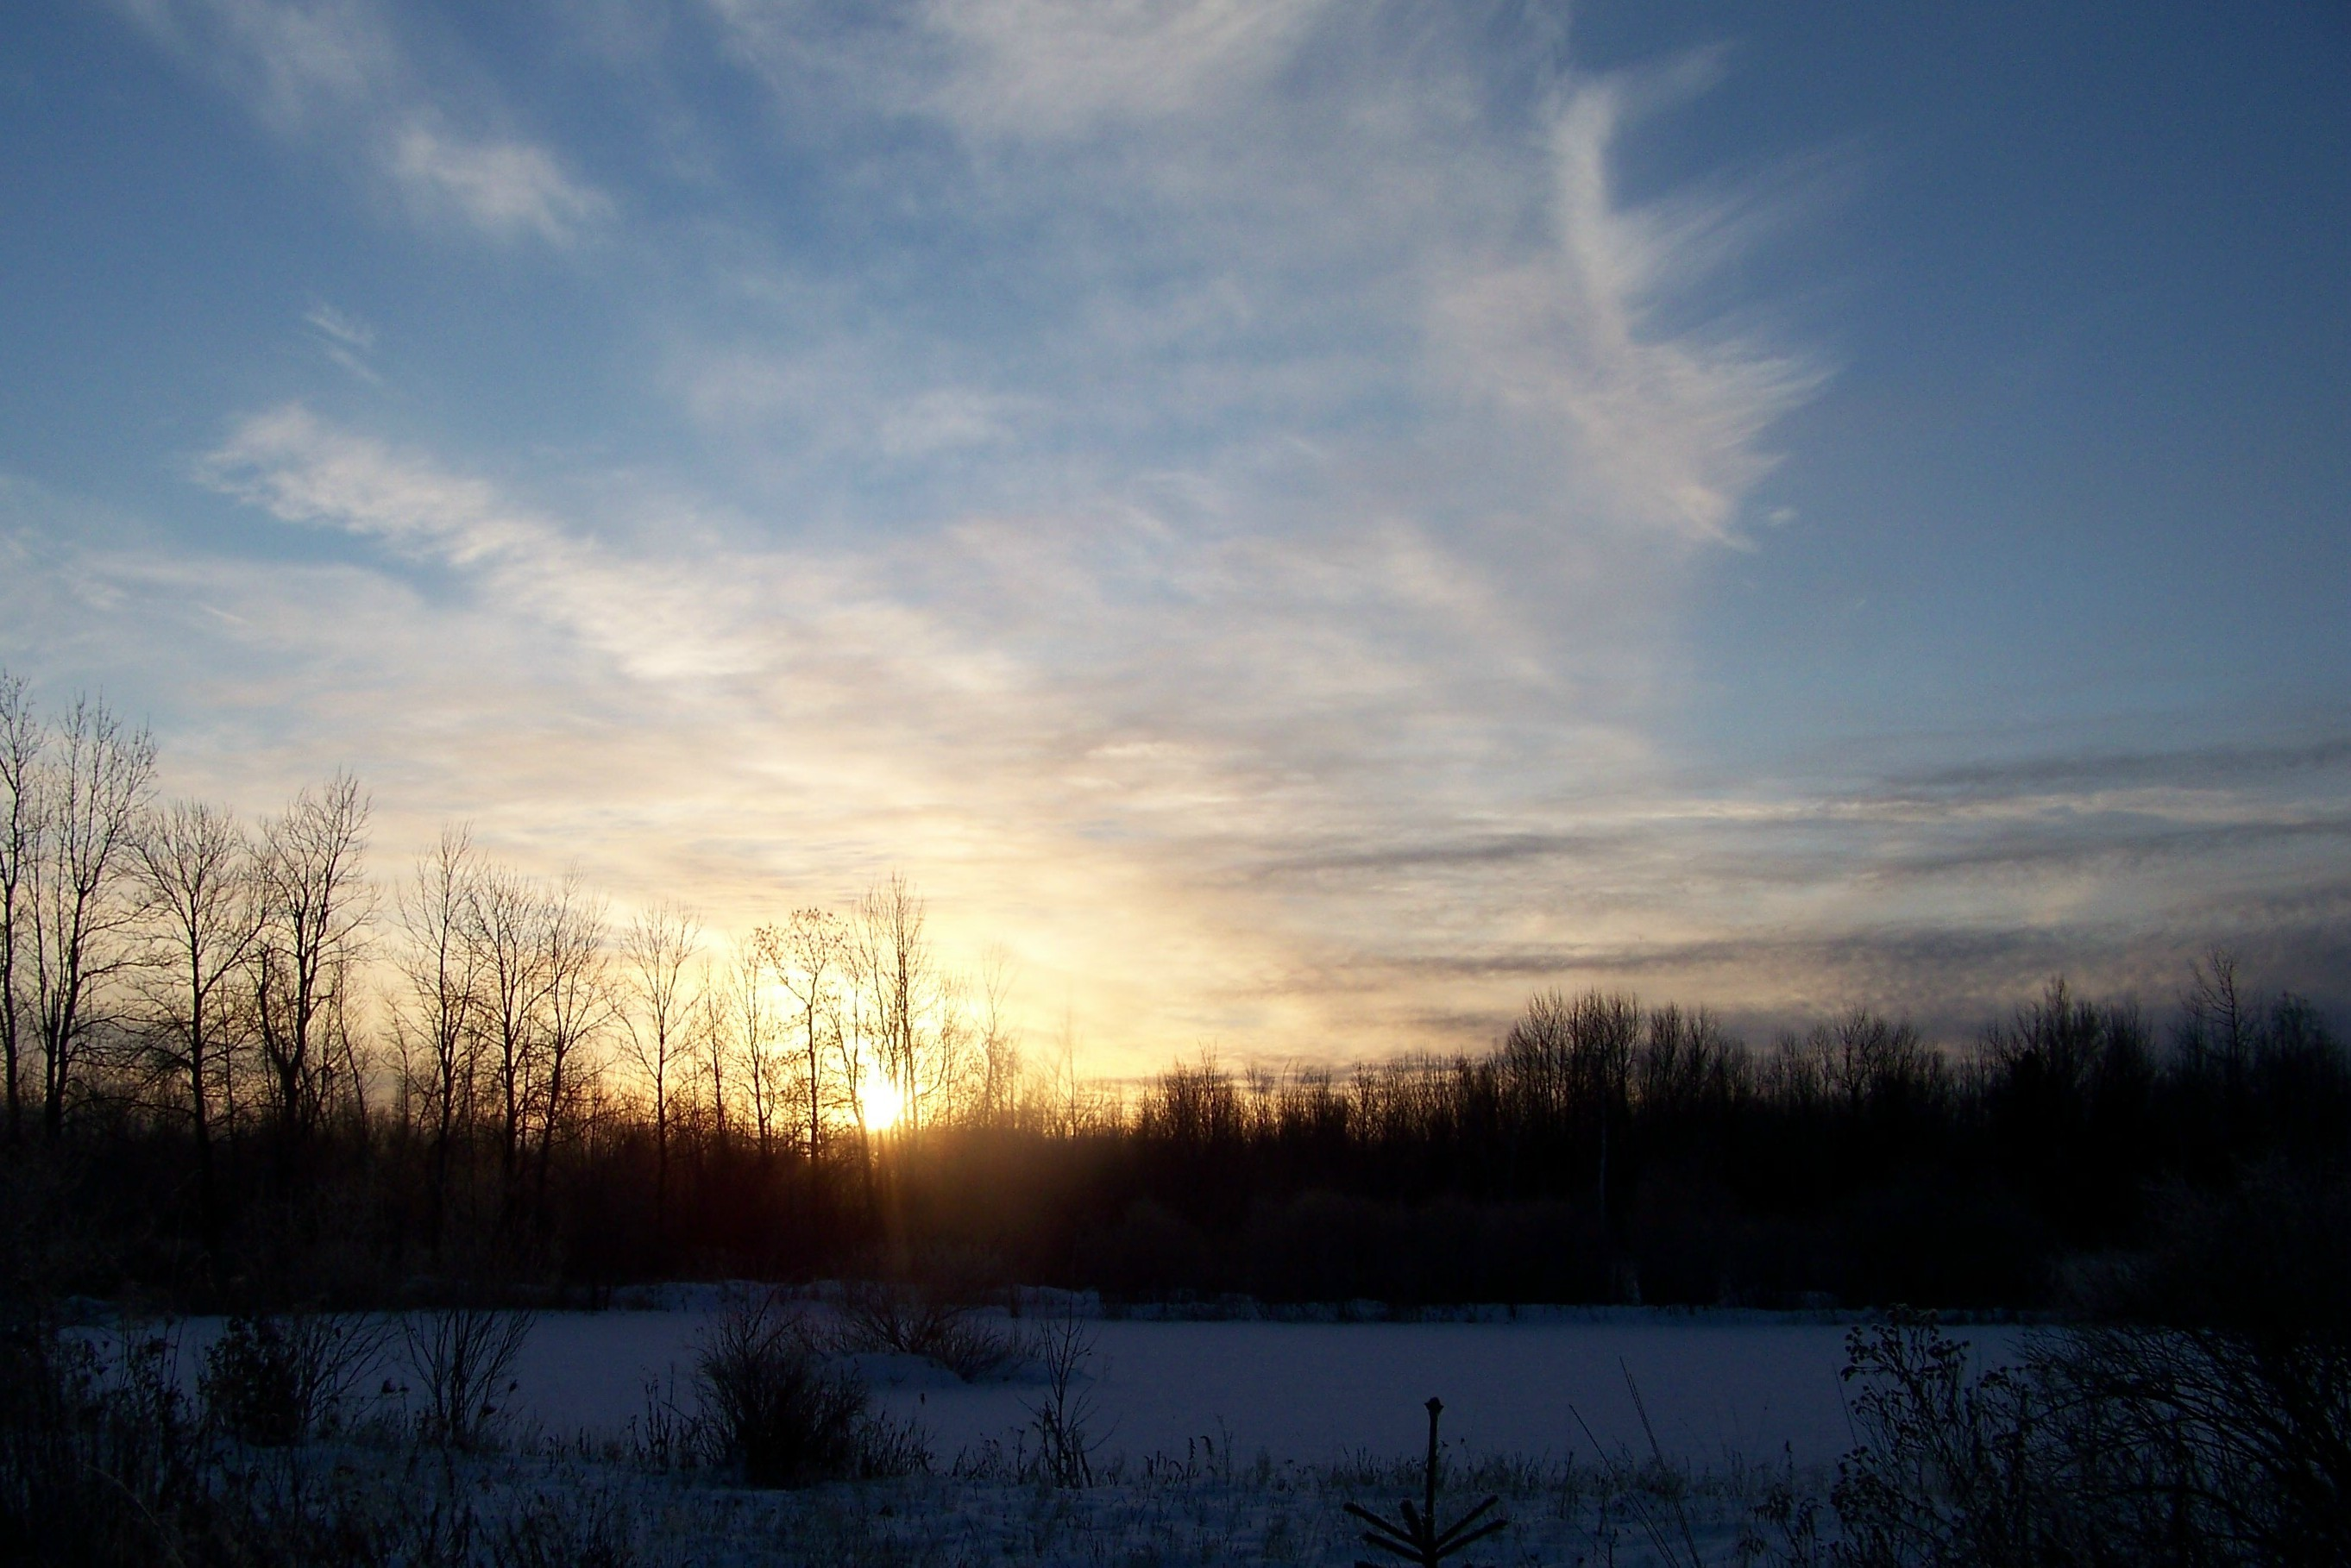 Download Winter Solstice Day Darkly Background Photo Wallpaper #74240  px 840.19 KB Nature &